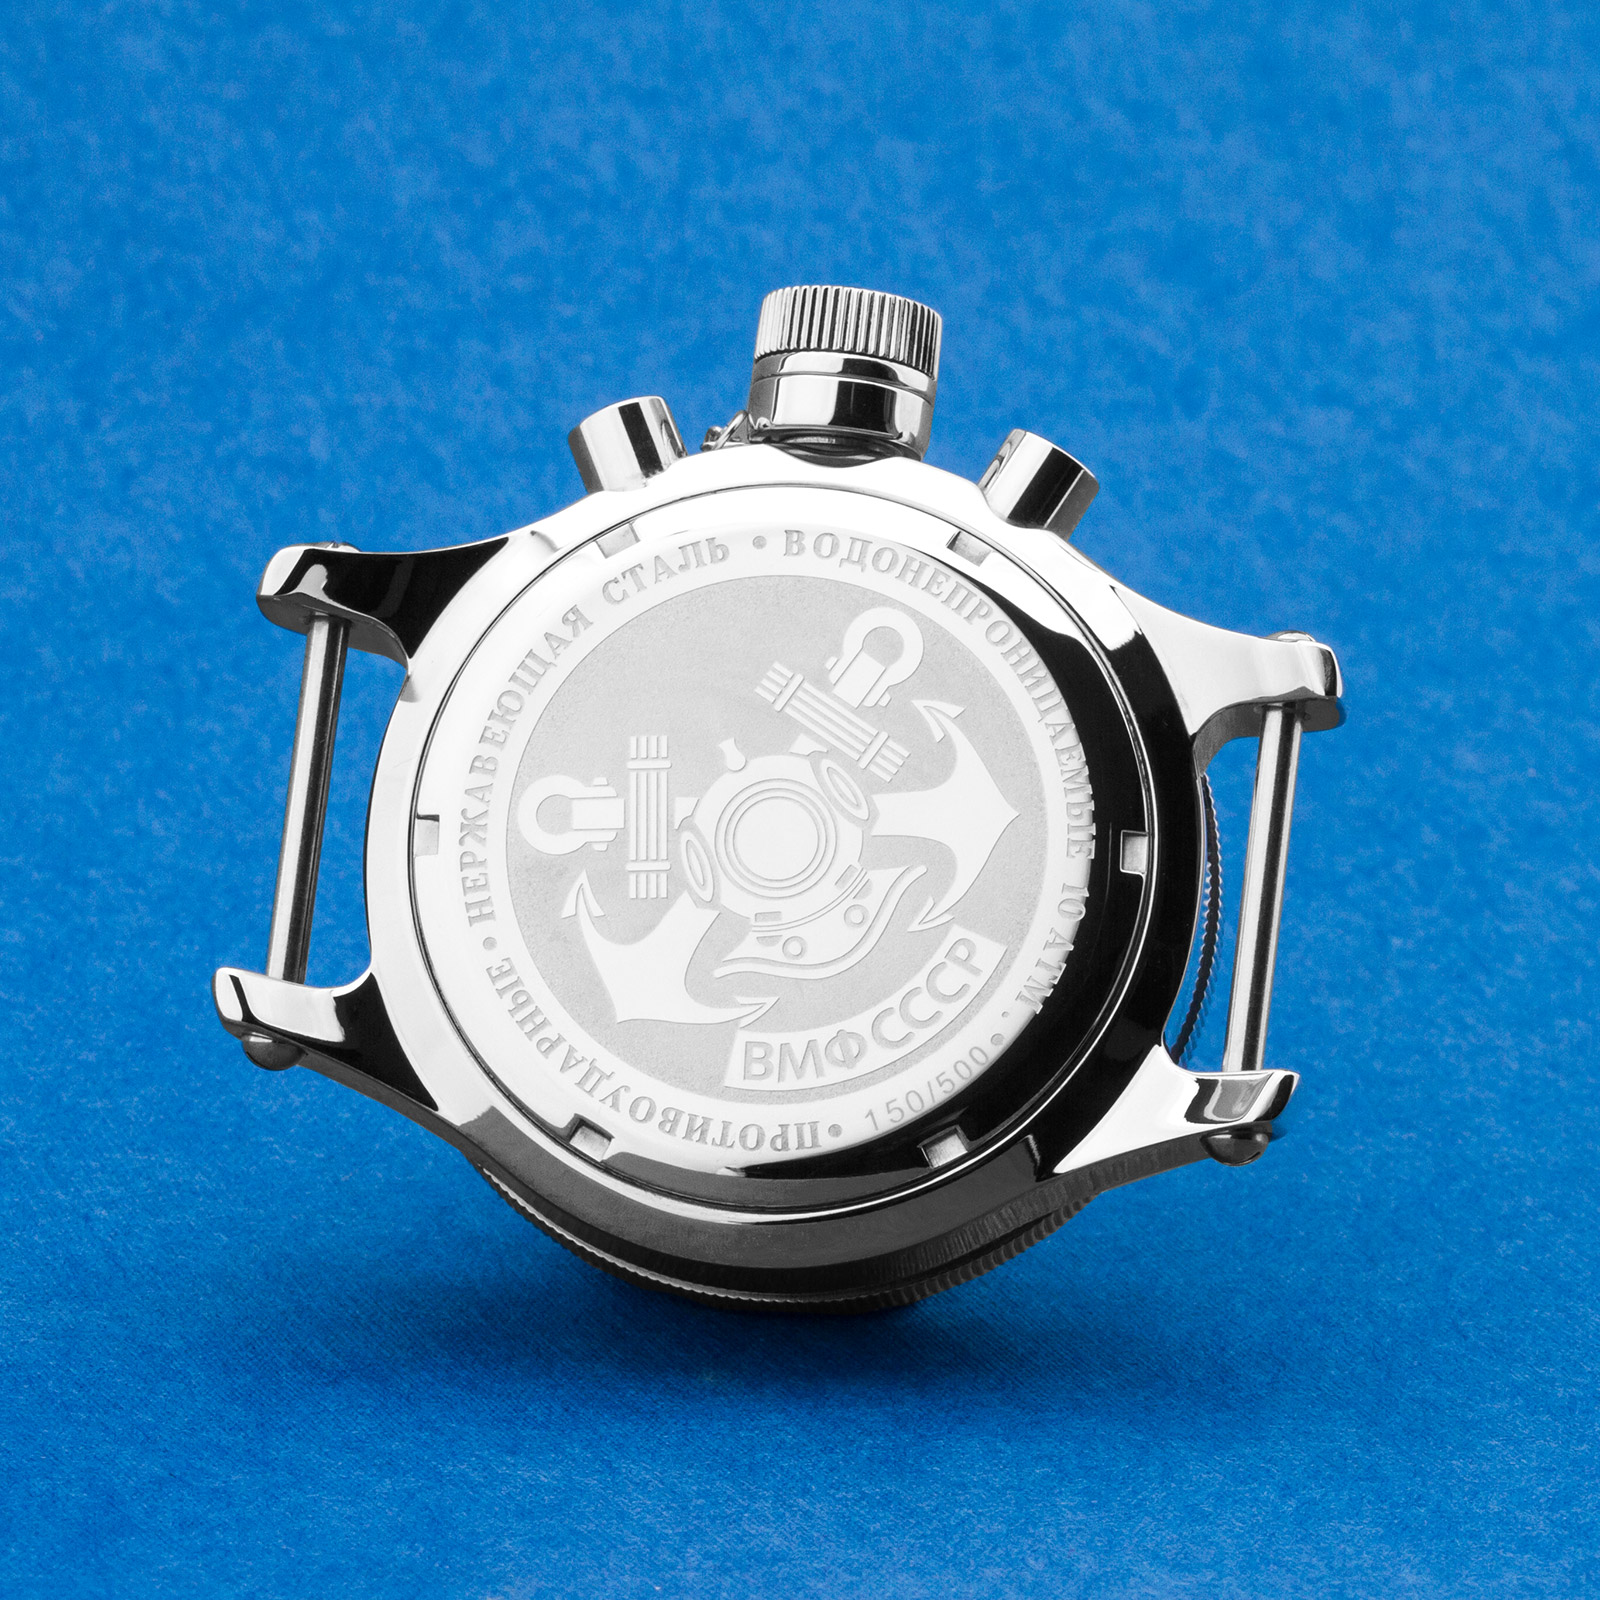 Taucheruhr-POLJOT-Edelstahl-Gehaeuse-Uhrengehaeuse-Diver-watch-case-mvm-3133-31681 Indexbild 4